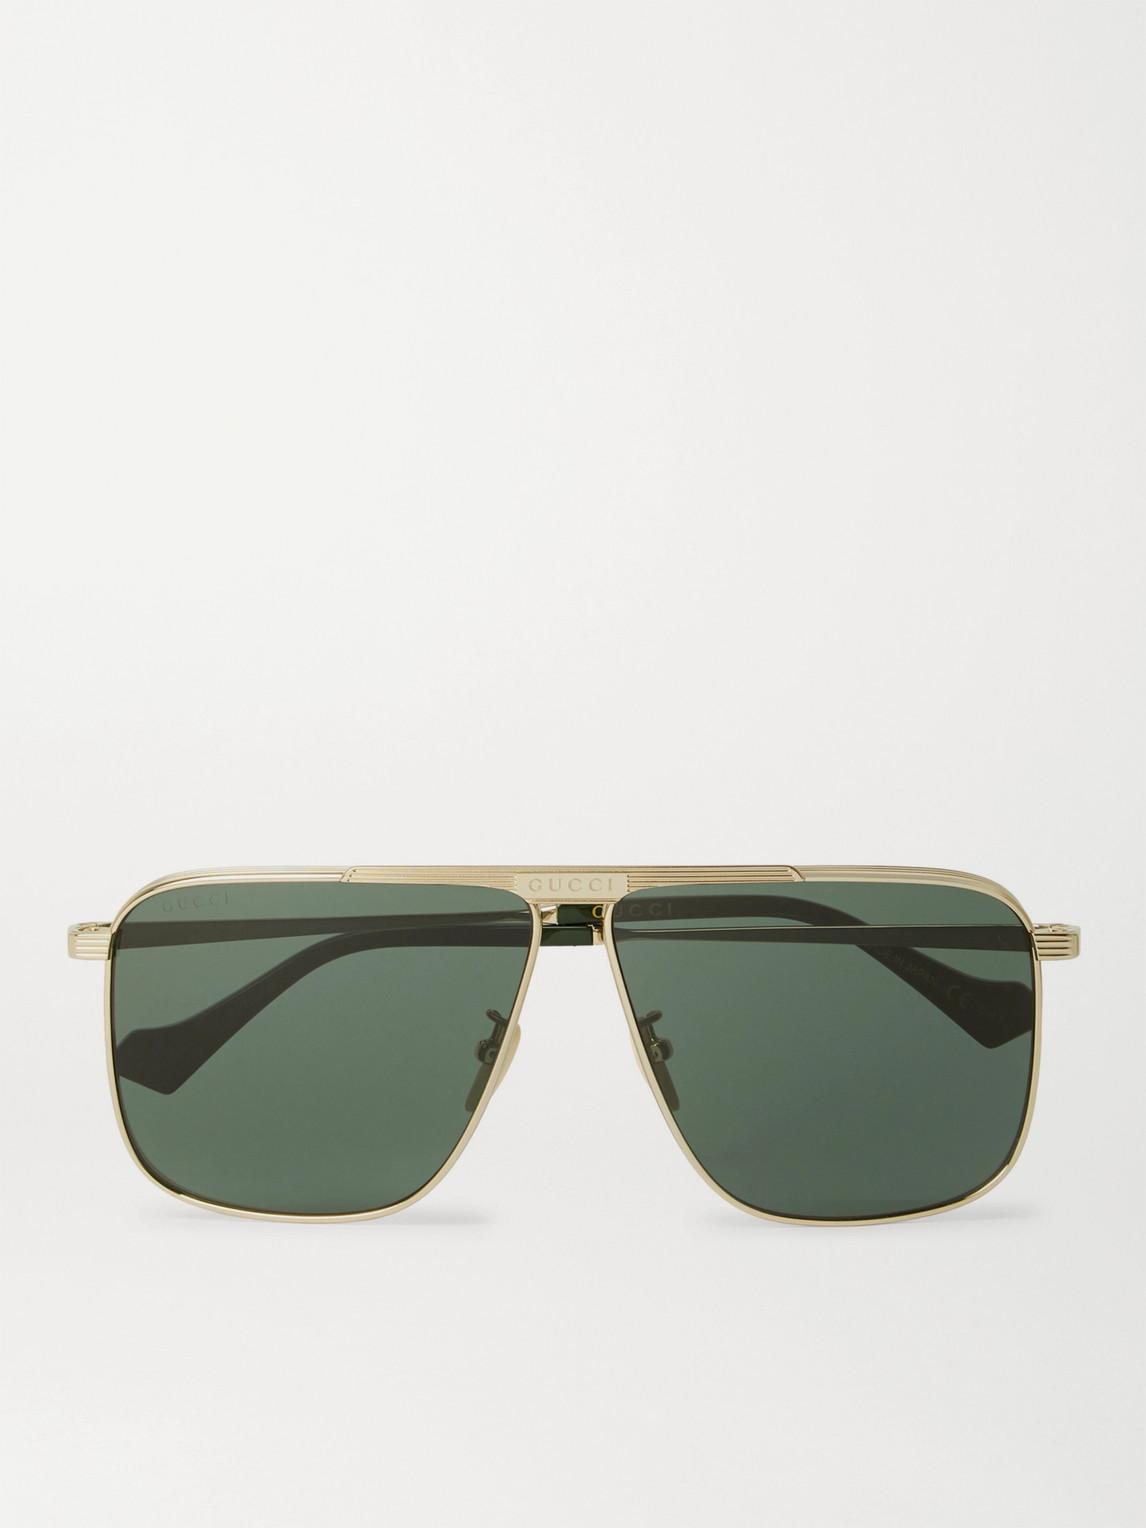 Gucci - D-Frame Gold-Tone Sunglasses - Men - Gold